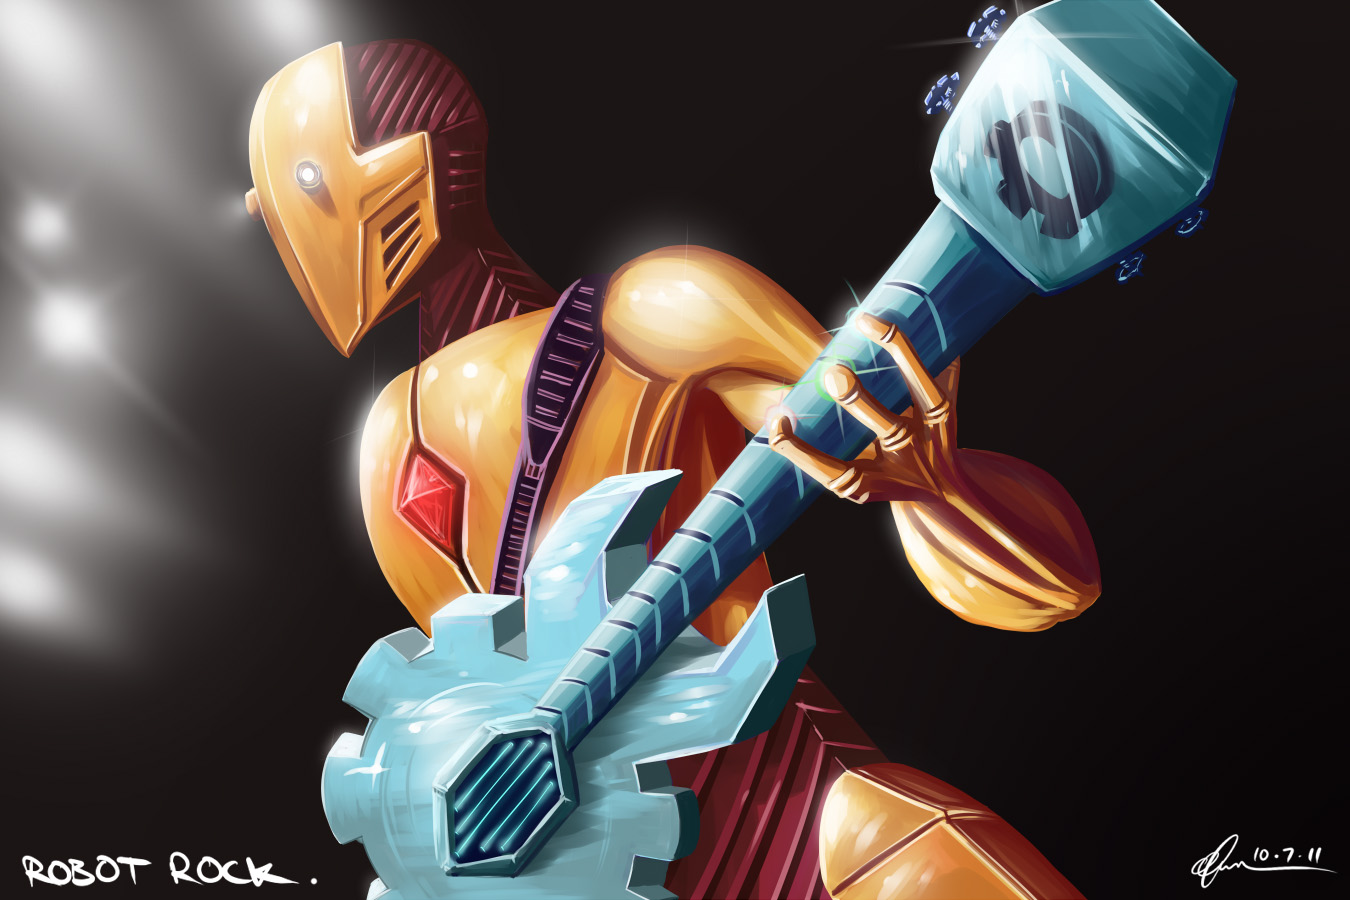 Robot Rock.